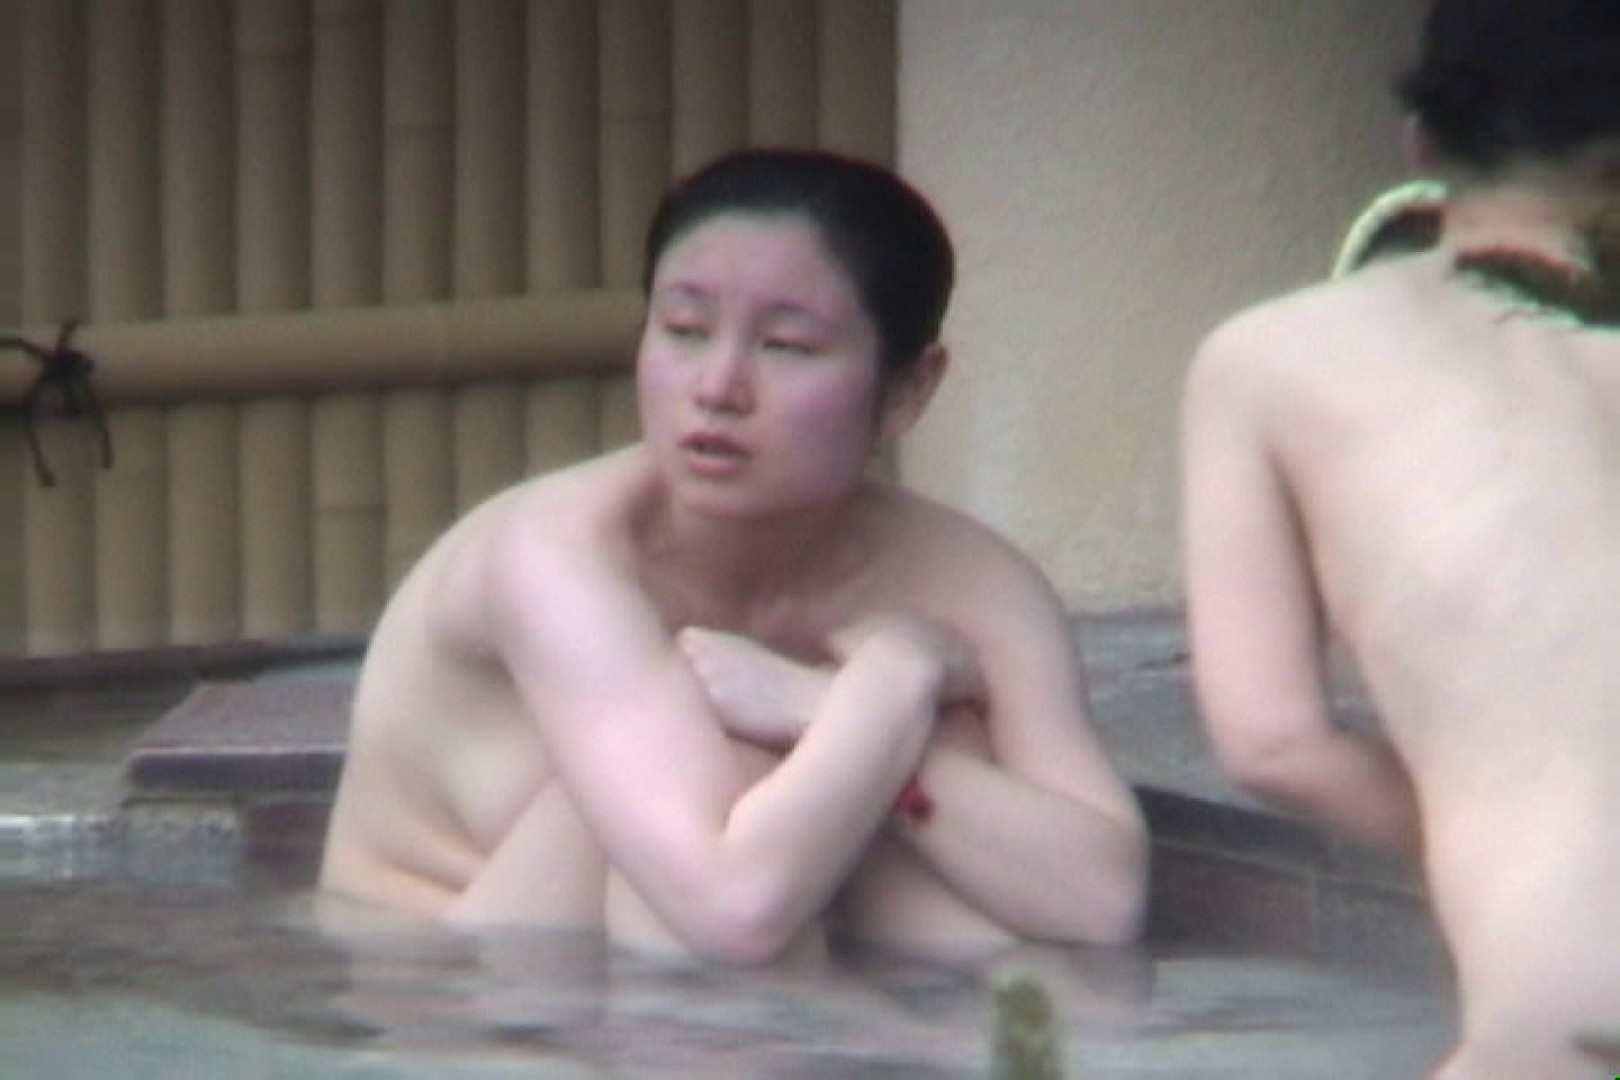 Aquaな露天風呂Vol.45【VIP限定】 HなOL   盗撮  100pic 4